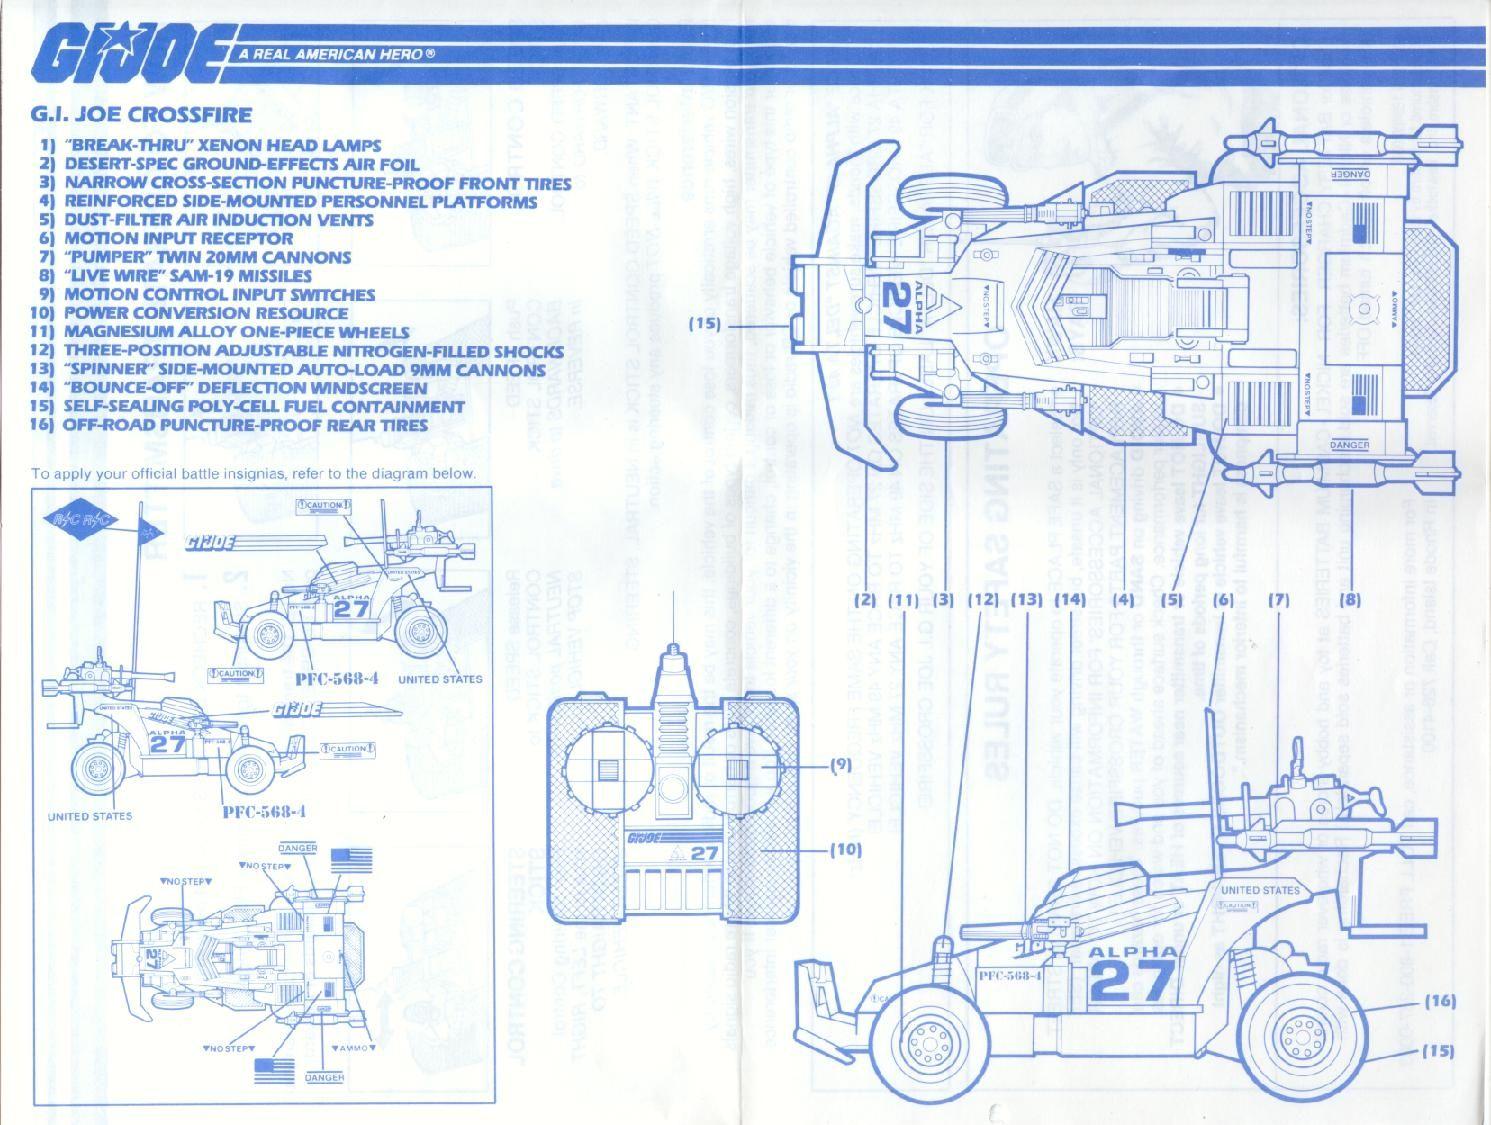 Gi crossfire blueprint blueprints pinterest crossfire and gi joe gi crossfire blueprint malvernweather Image collections